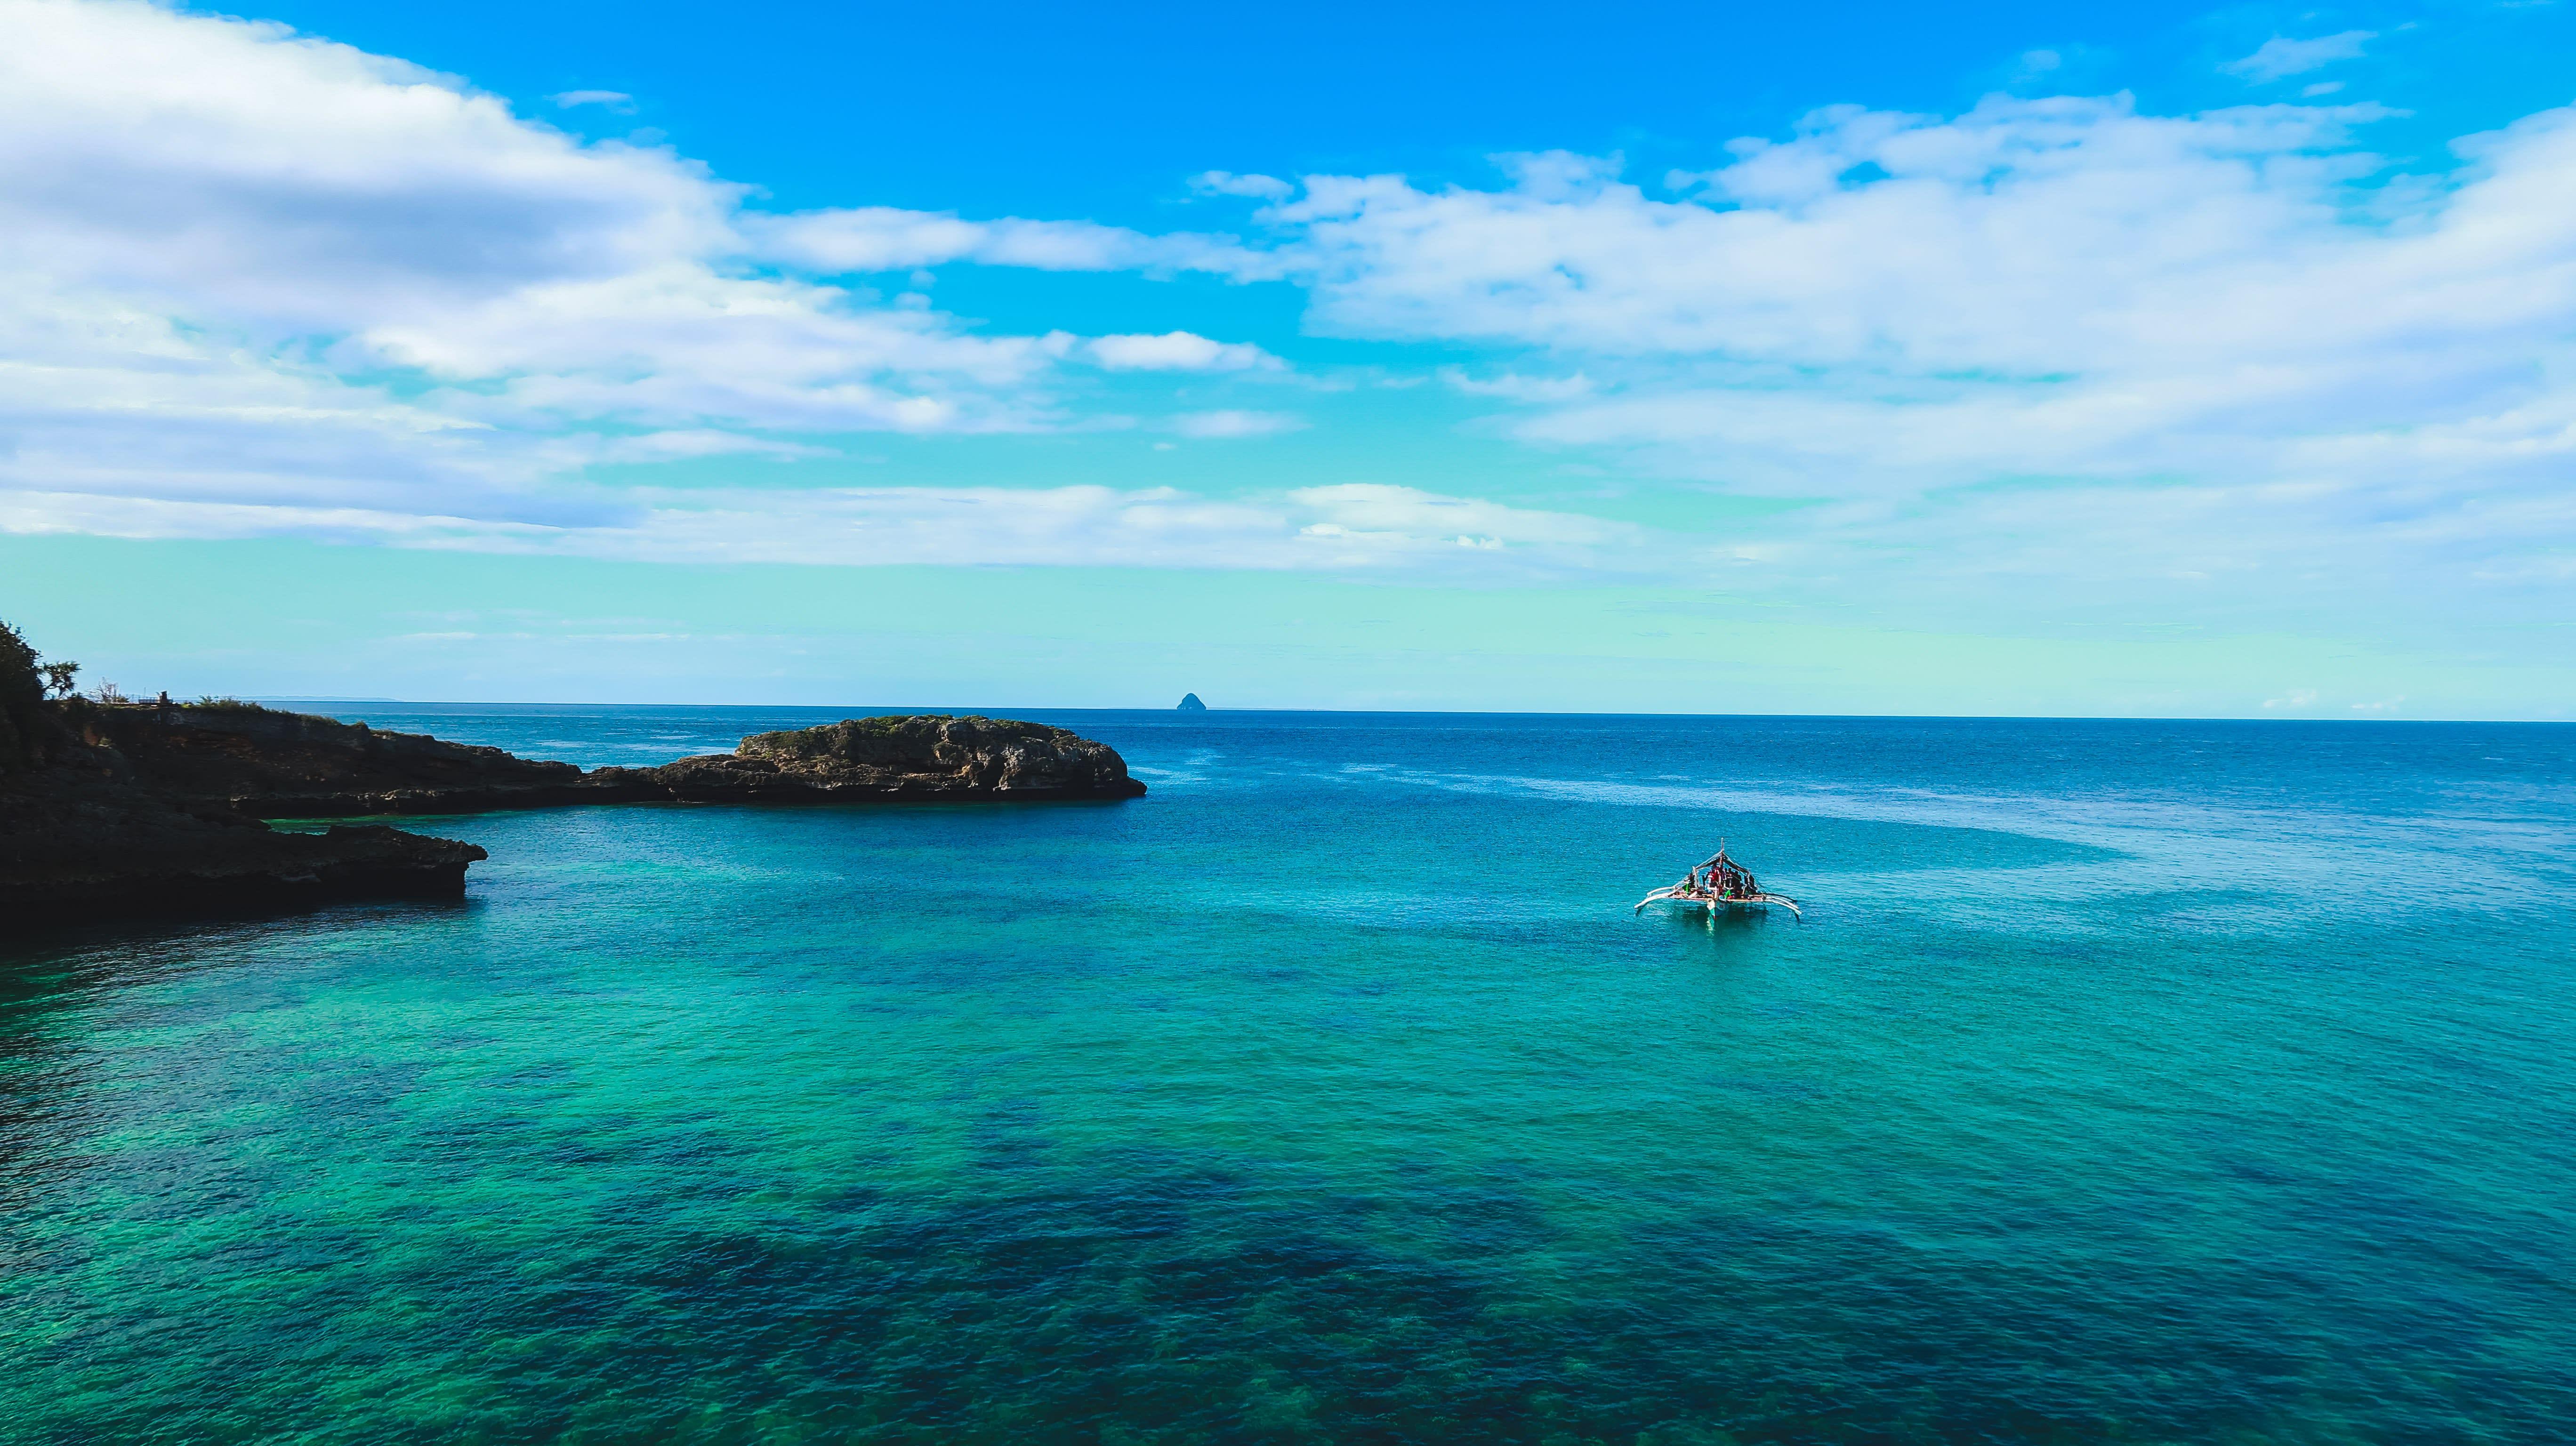 Cebu blue sea